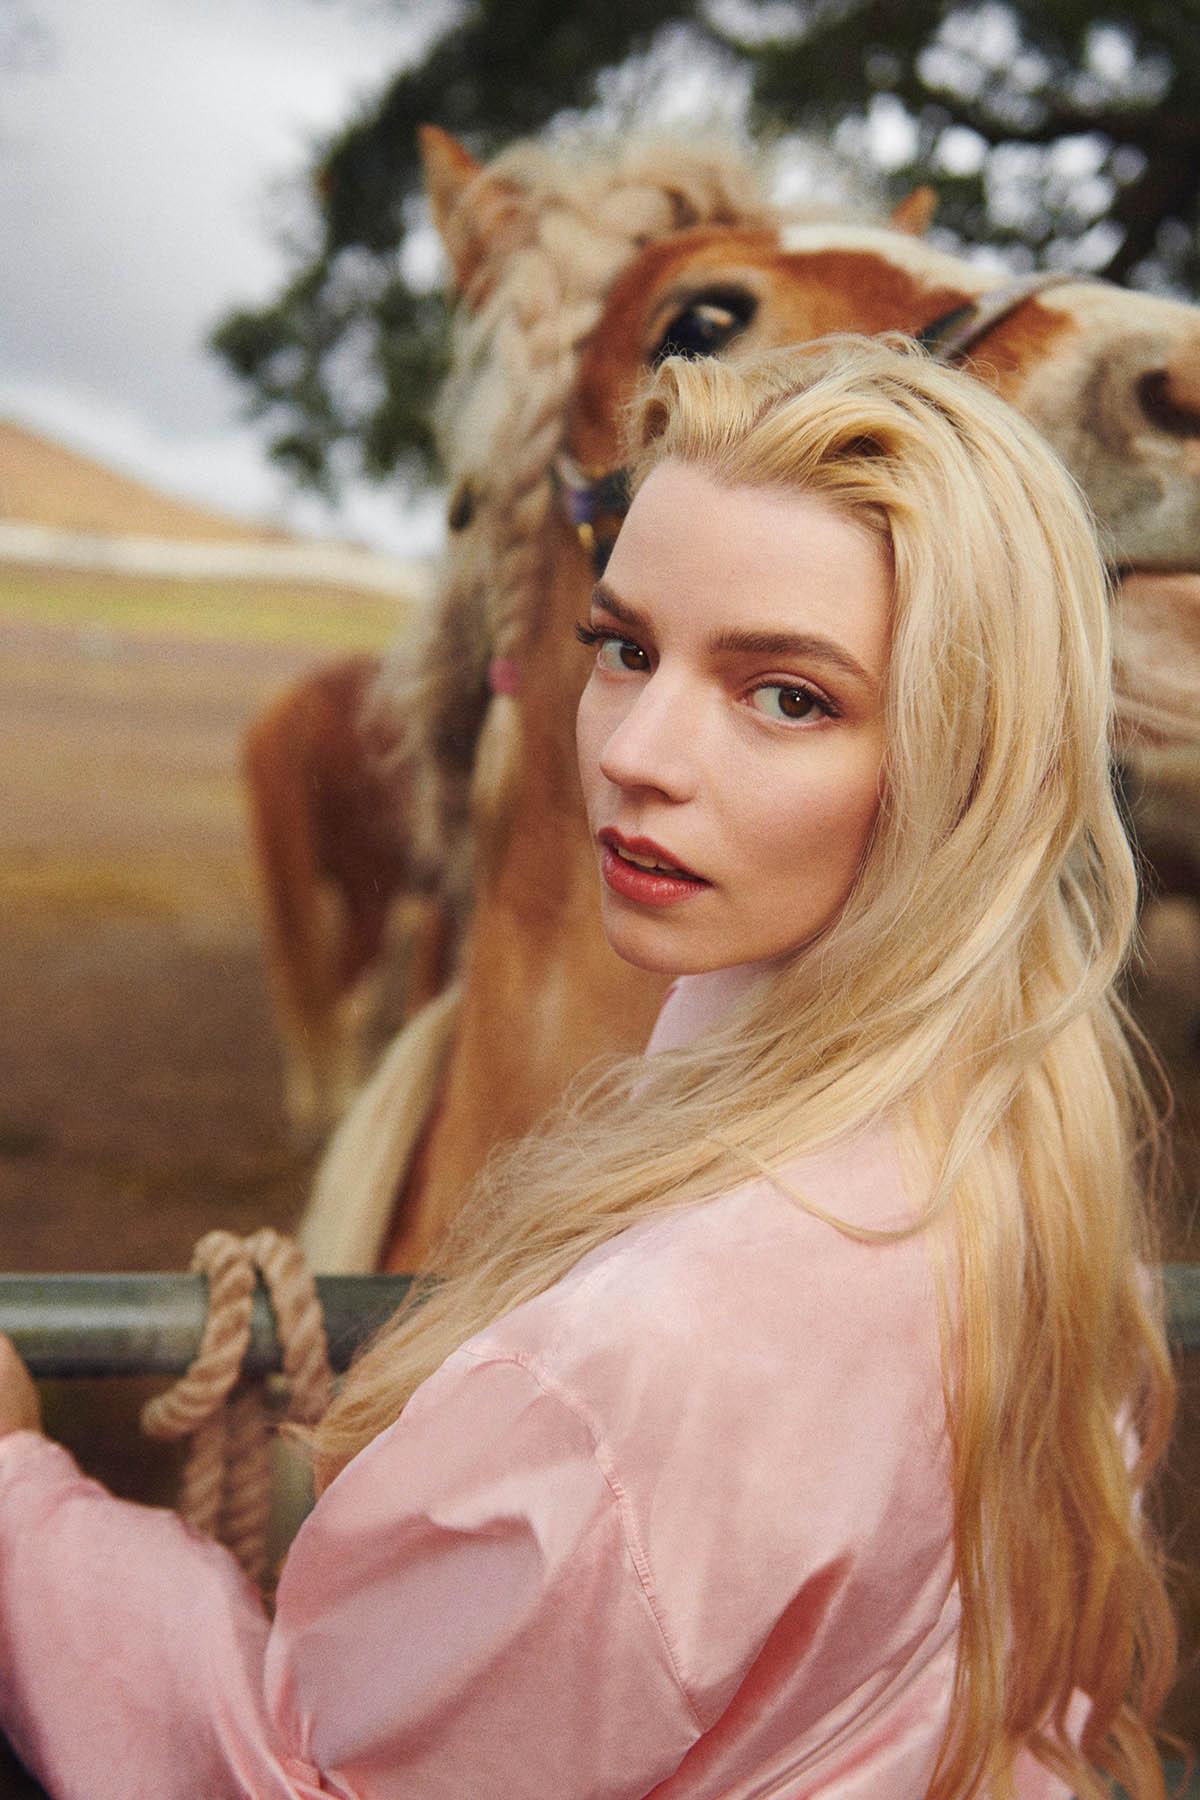 Anya Taylor-Joy covers Vanity Fair April 2021 by Ryan McGinley